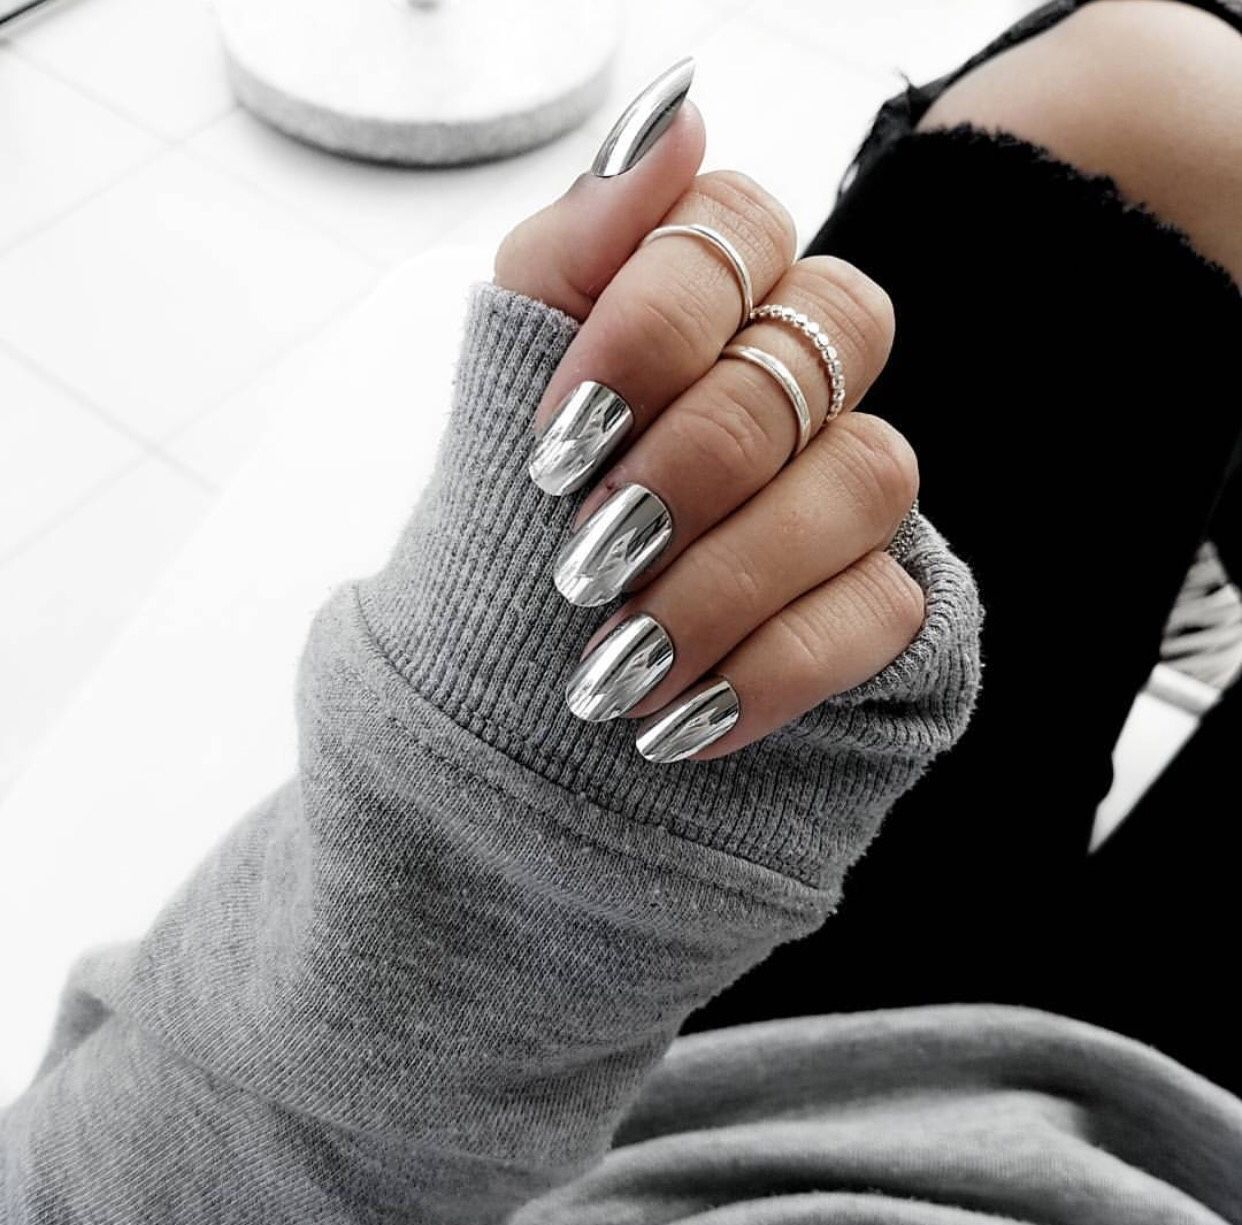 dcbarroso in 2020 Silver nails, Metallic nails, Nails